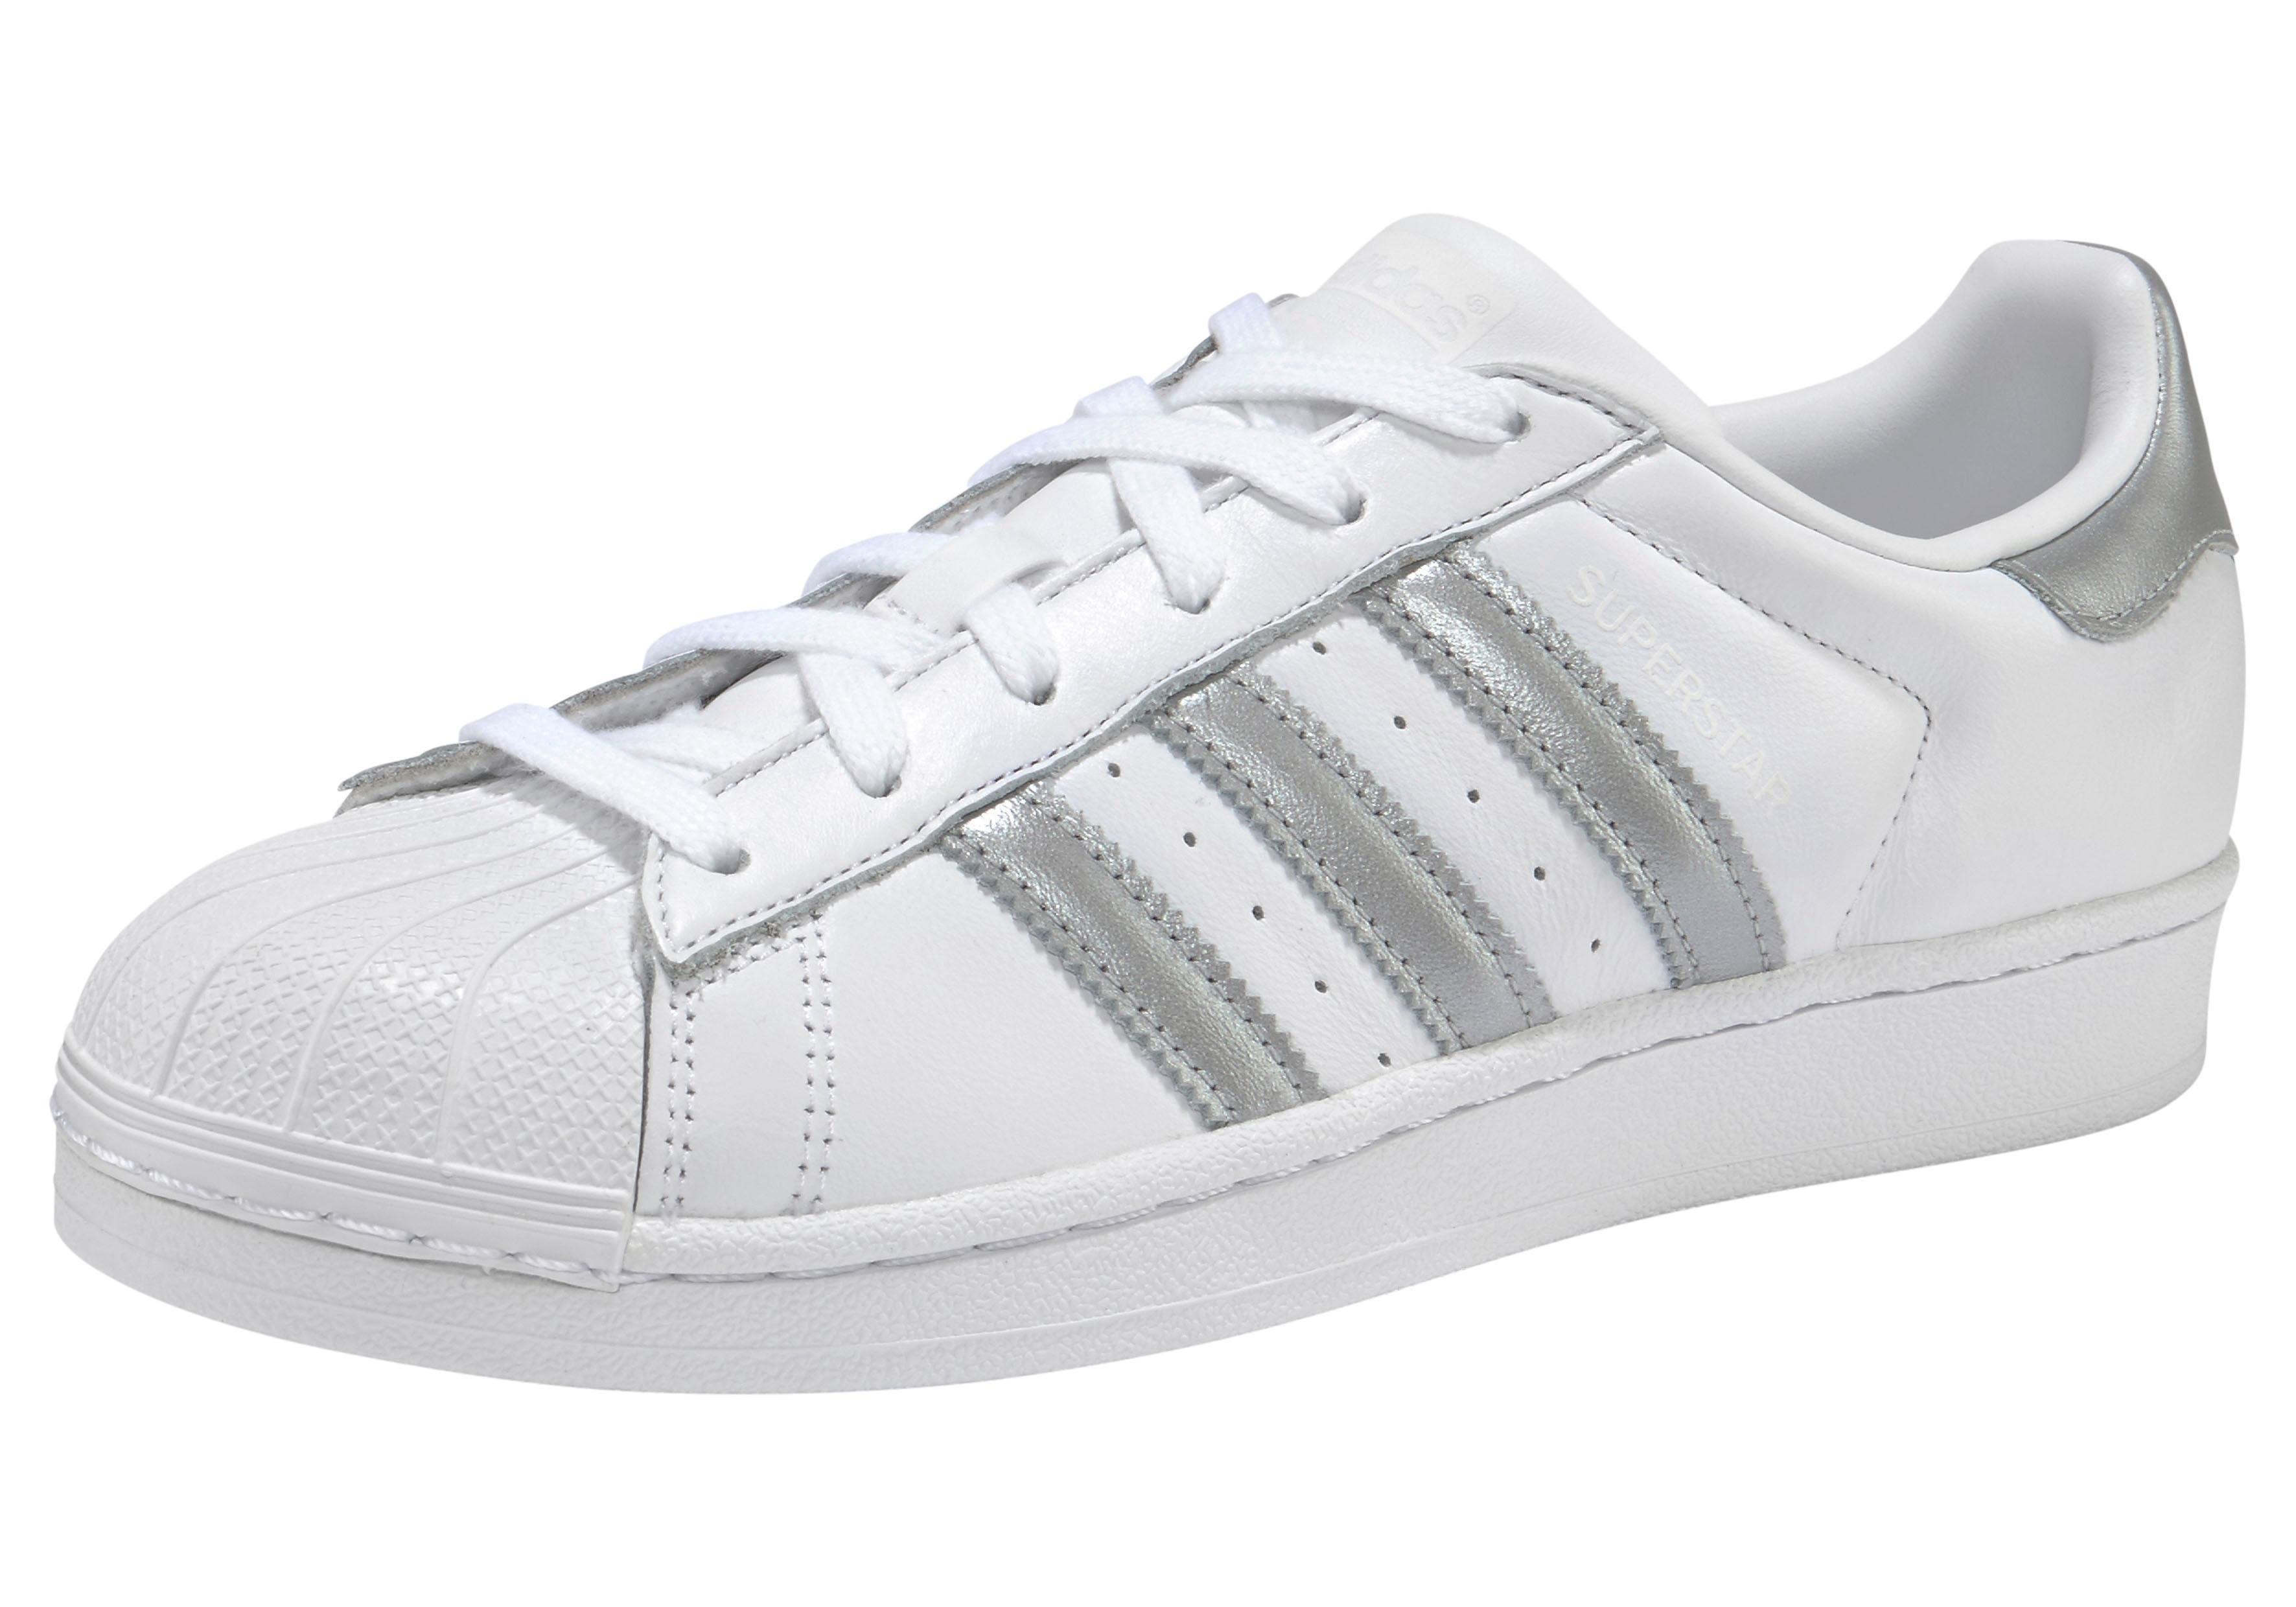 best website 97825 a0883 ... adidas Originals sneakers »Superstar W 1«, adidas Originals sneakers » Superstar W 1«, adidas Originals sneakers »Superstar W 1«